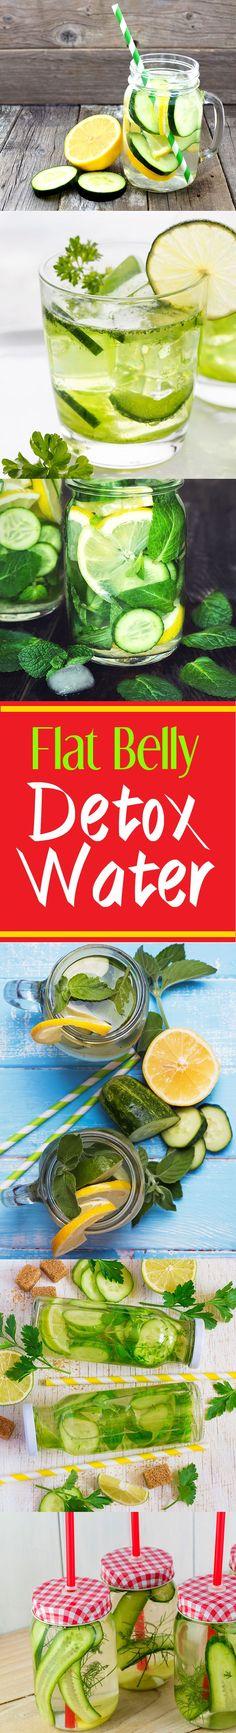 cucumber-lemon flat belly detox water